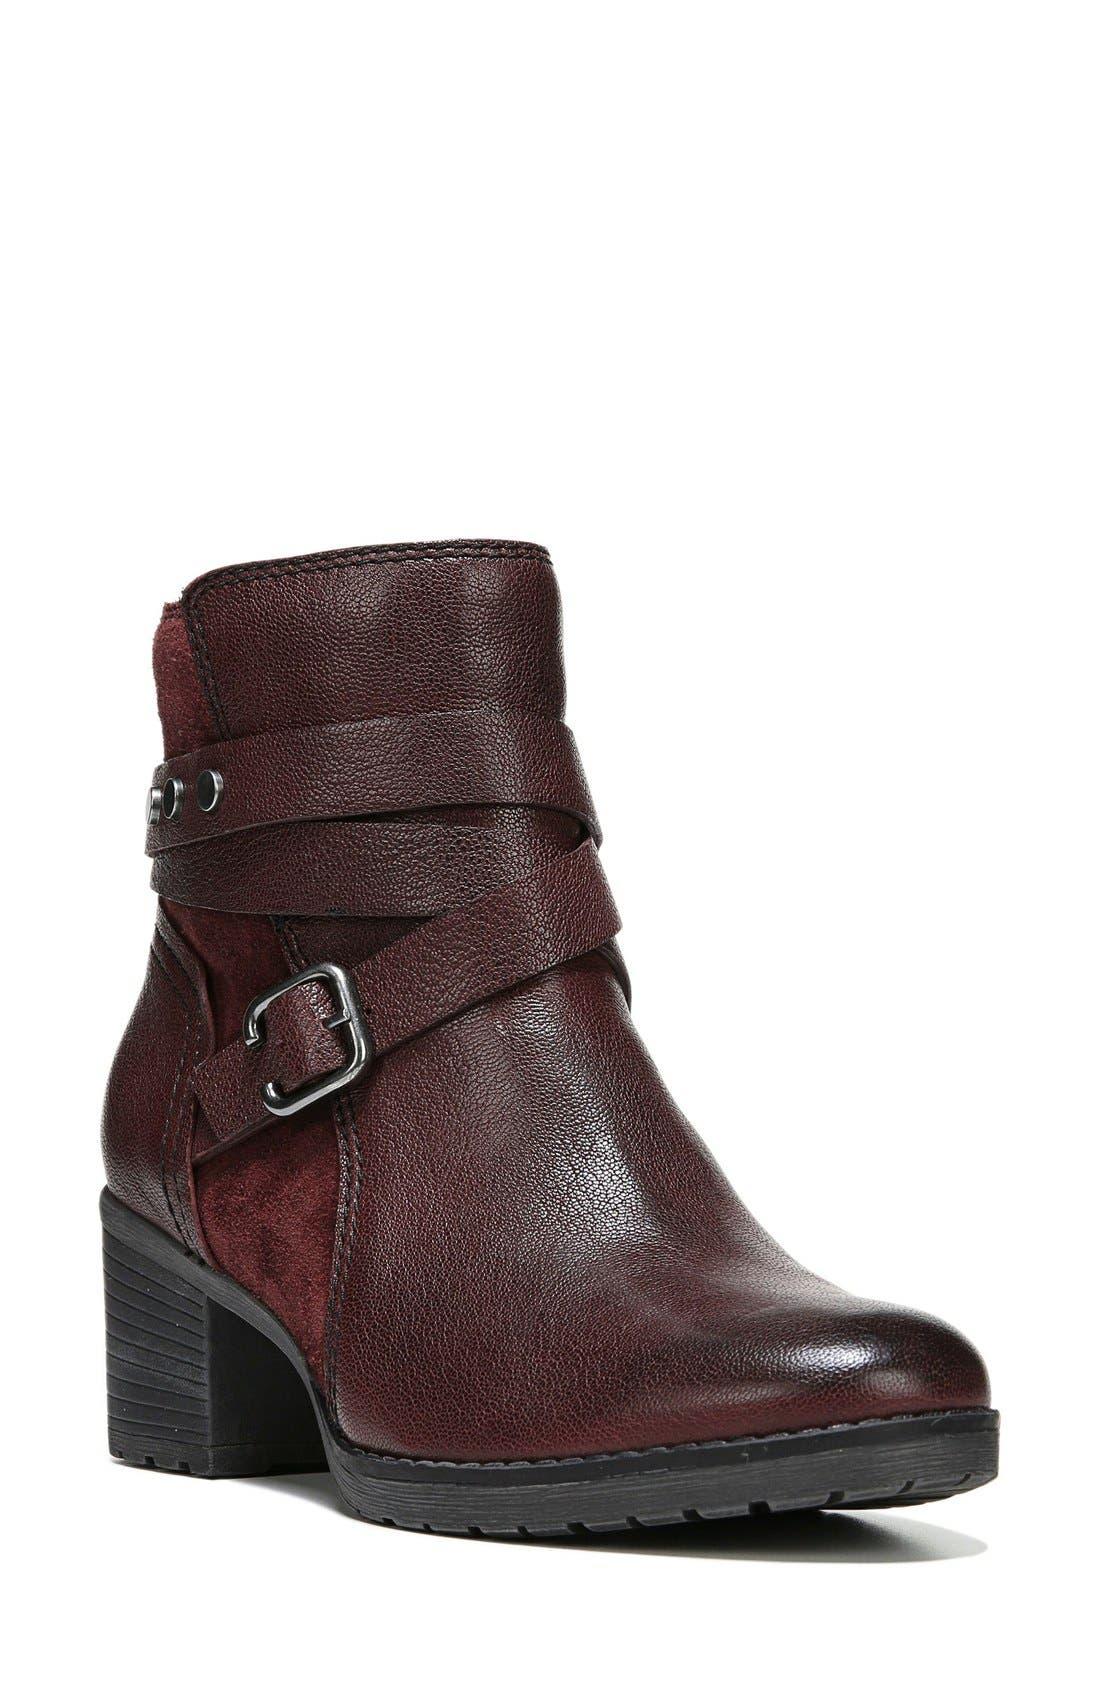 Main Image - Naturalizer 'Ringer' Boot (Women)